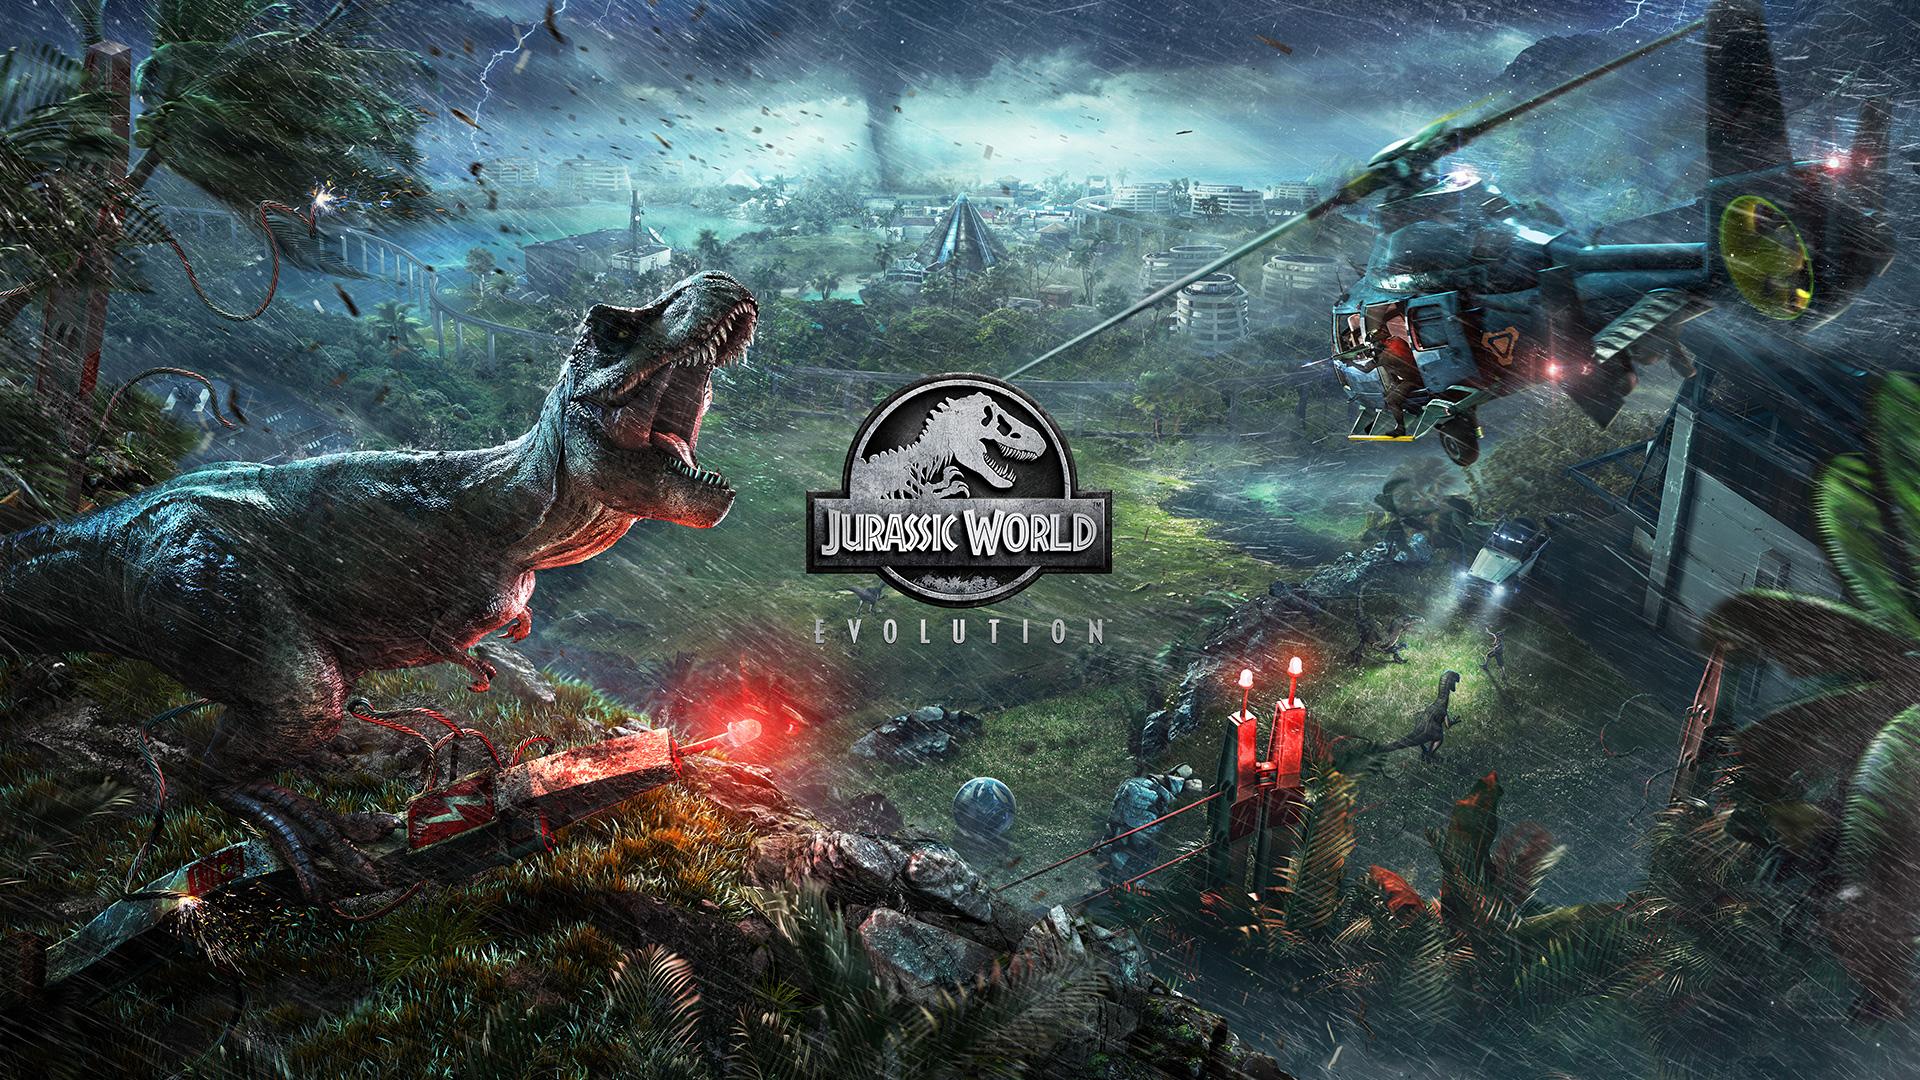 Jurassic world evolution free downloads